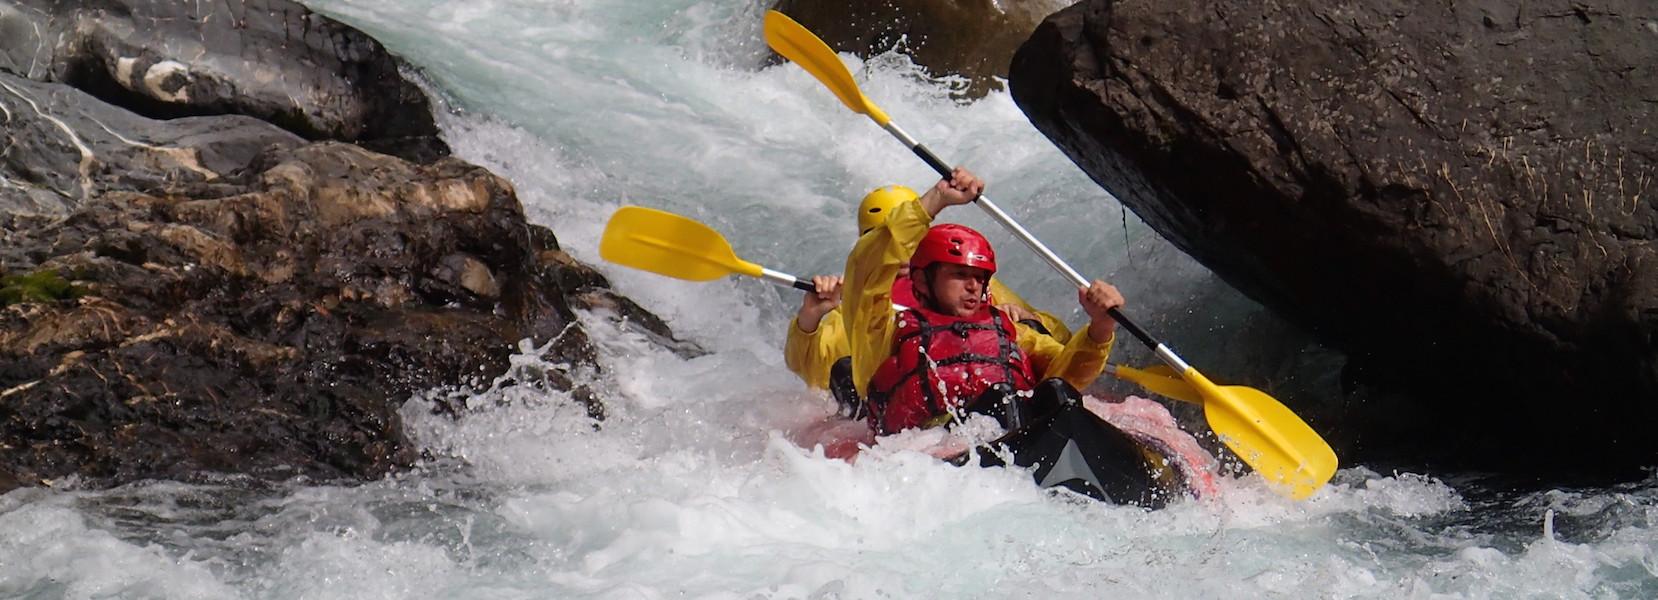 Parcours sportif en kayak dans la vésubie alpes maritimes nice.